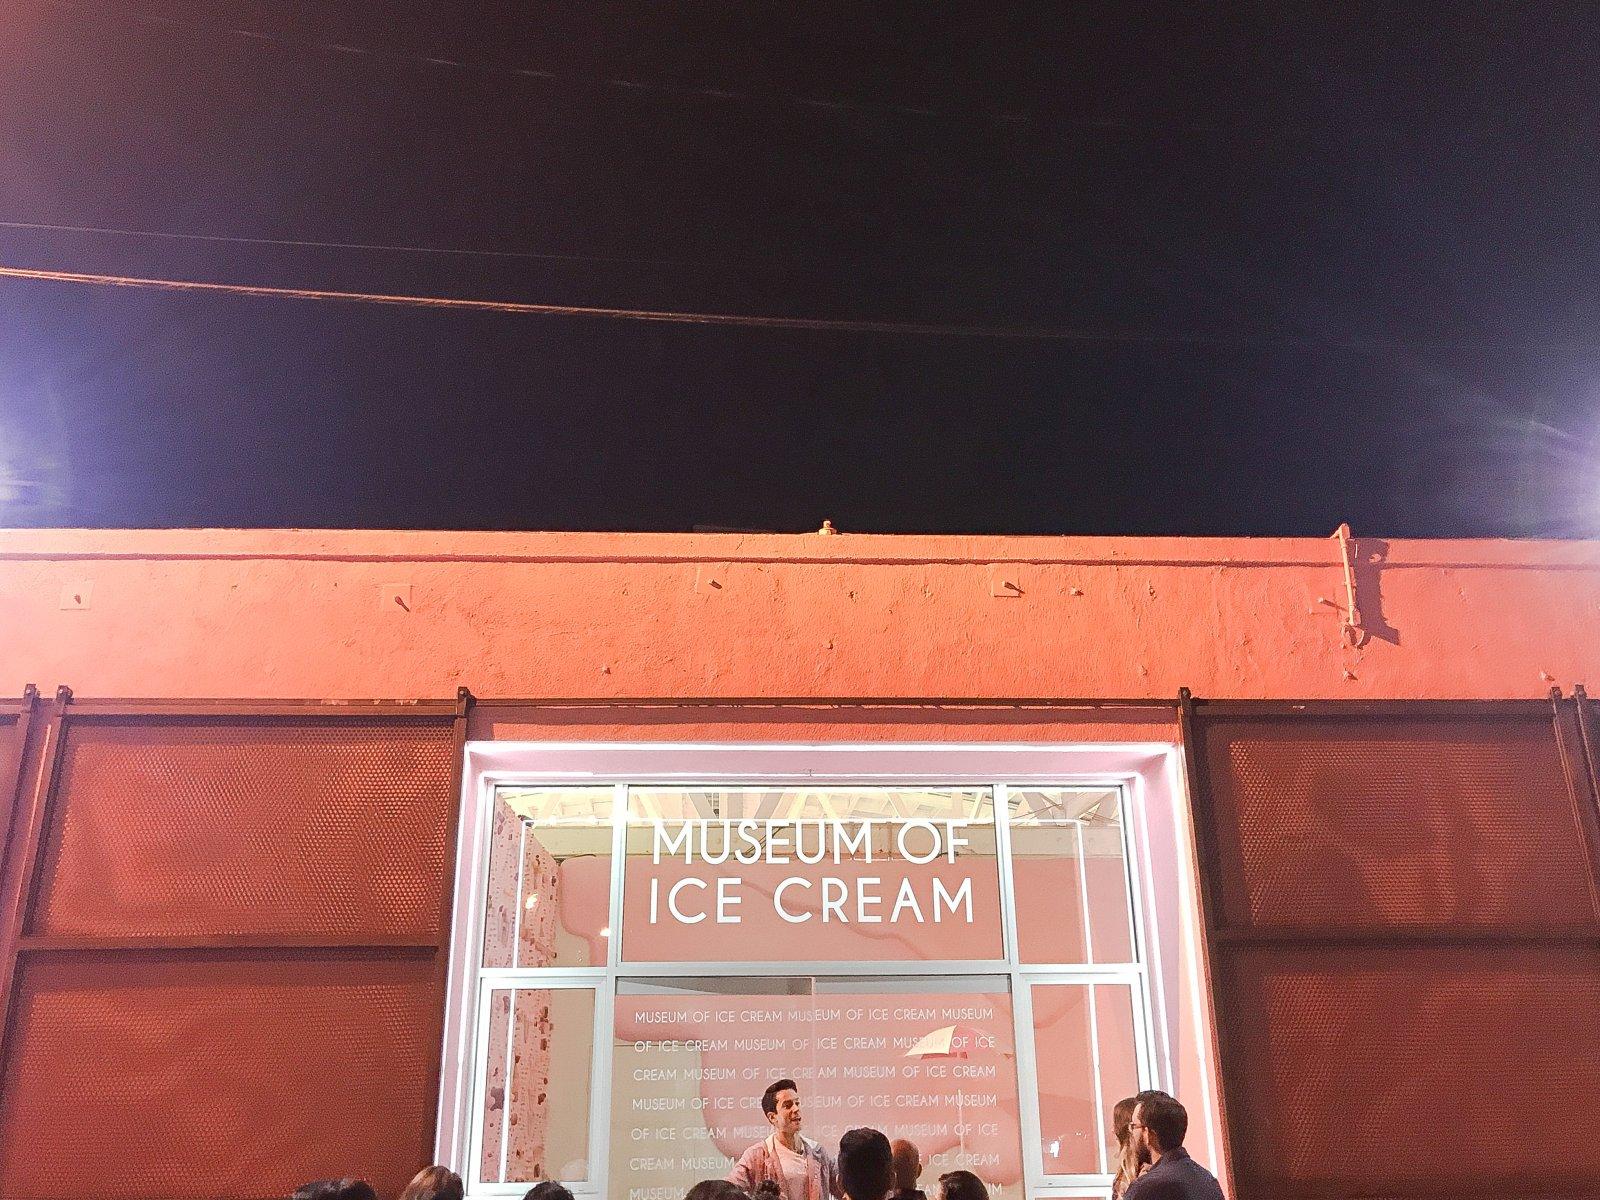 Museum of Ice Cream Los Angeles Entrance